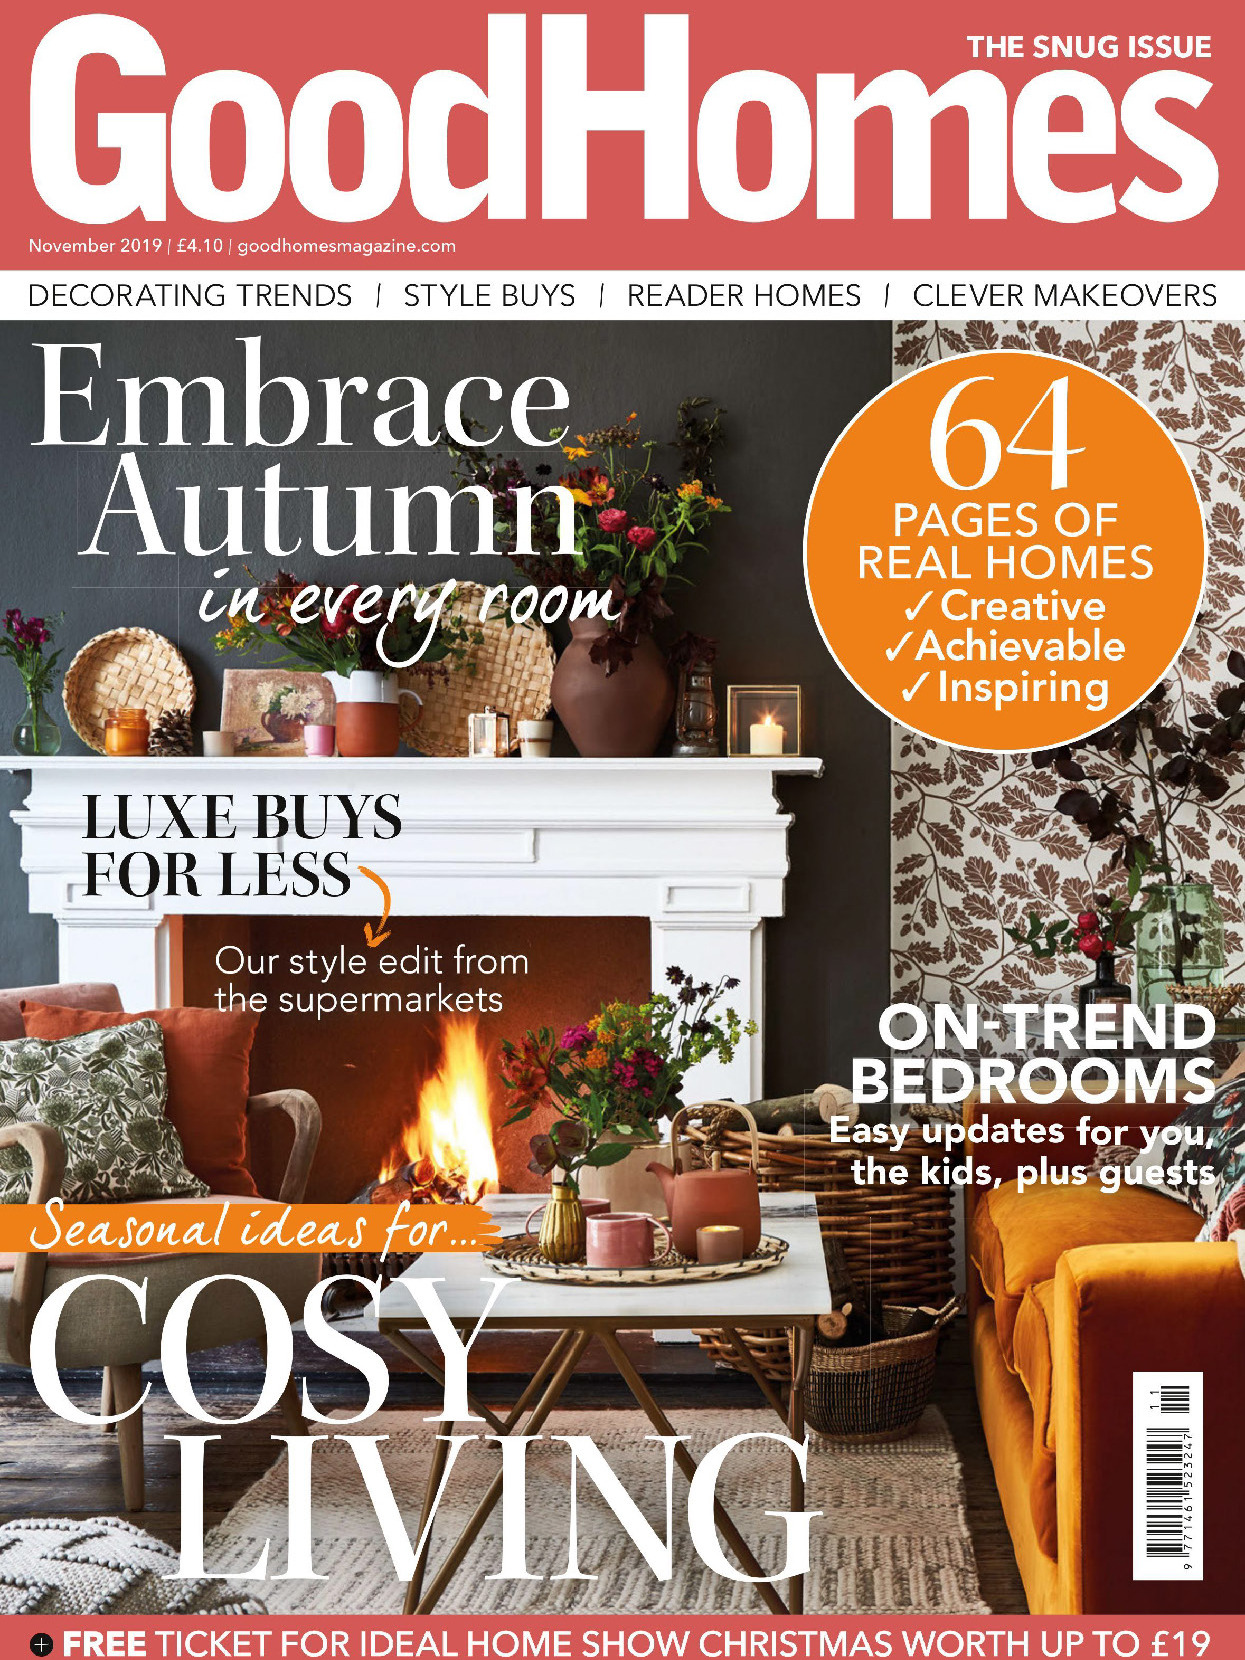 《Good Homes》英国版居家室内设计杂志2019年11月号